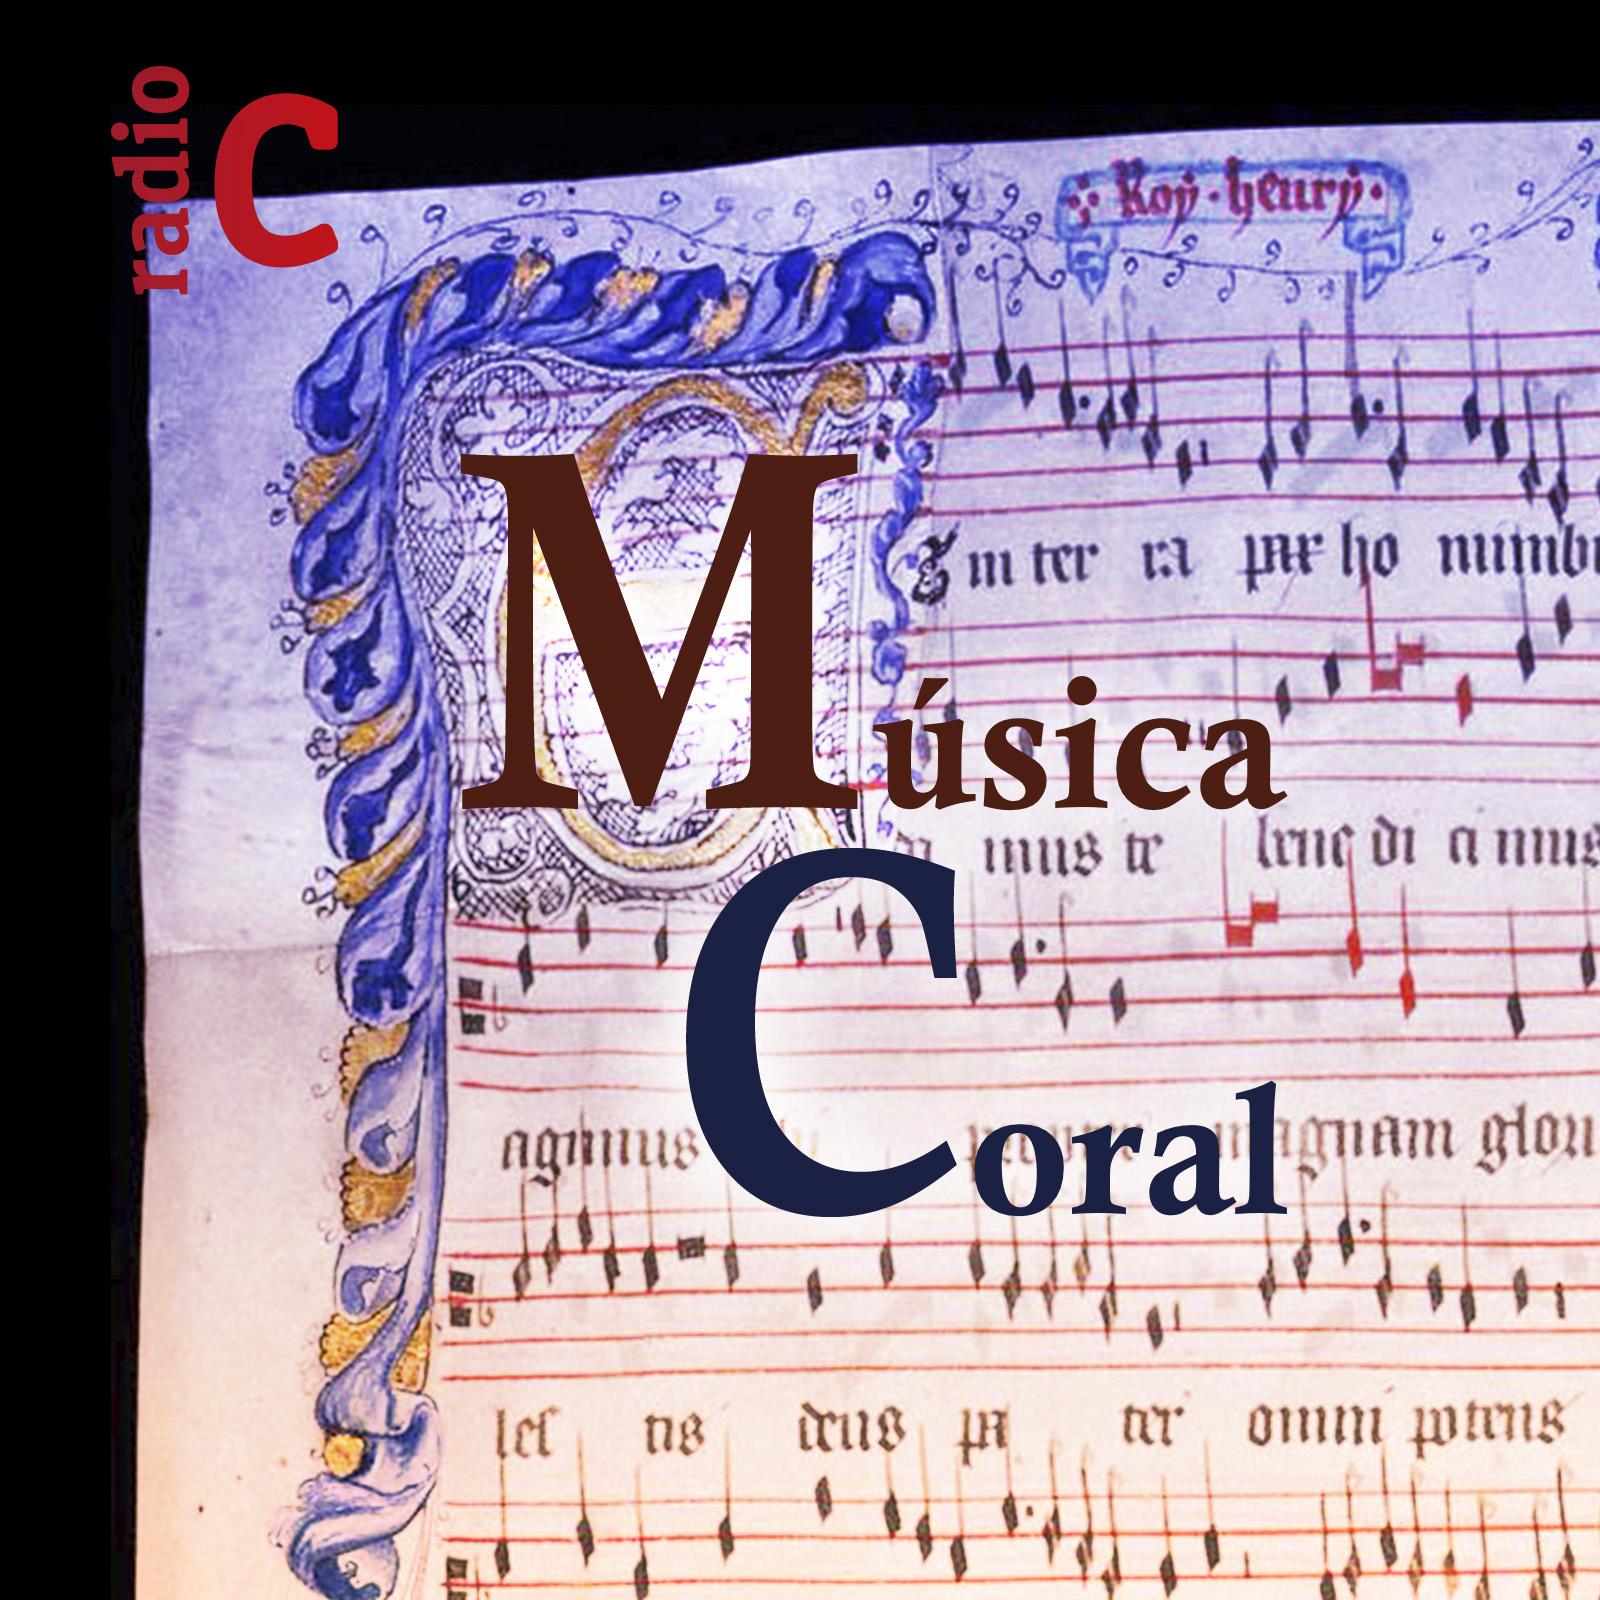 Música coral - Bernat Vivancos. Obras corales. Blanc - 23/02/12